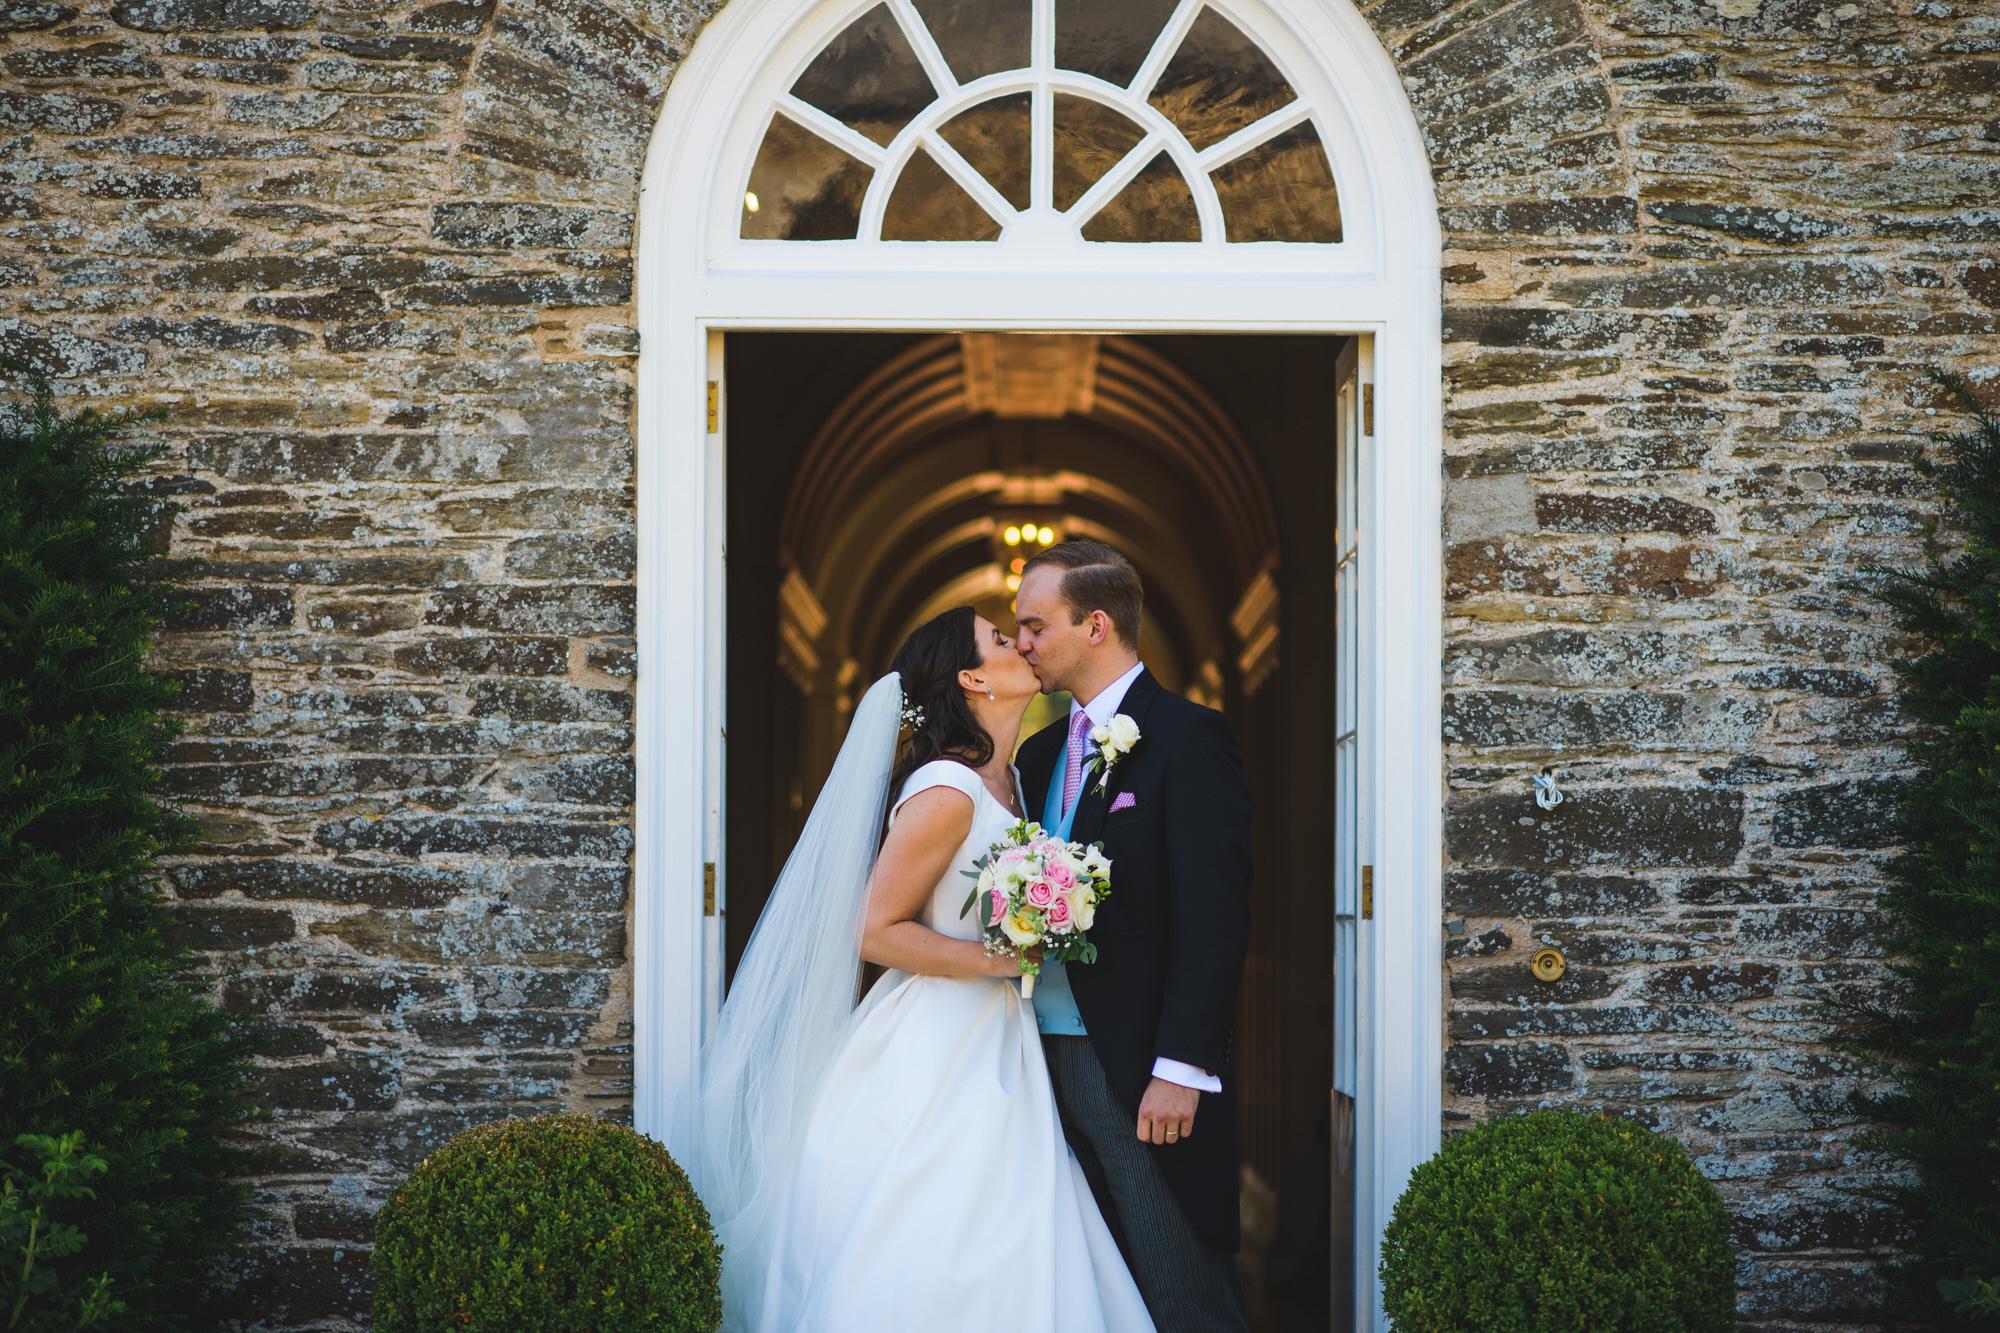 Shilstone wedding photographer 20